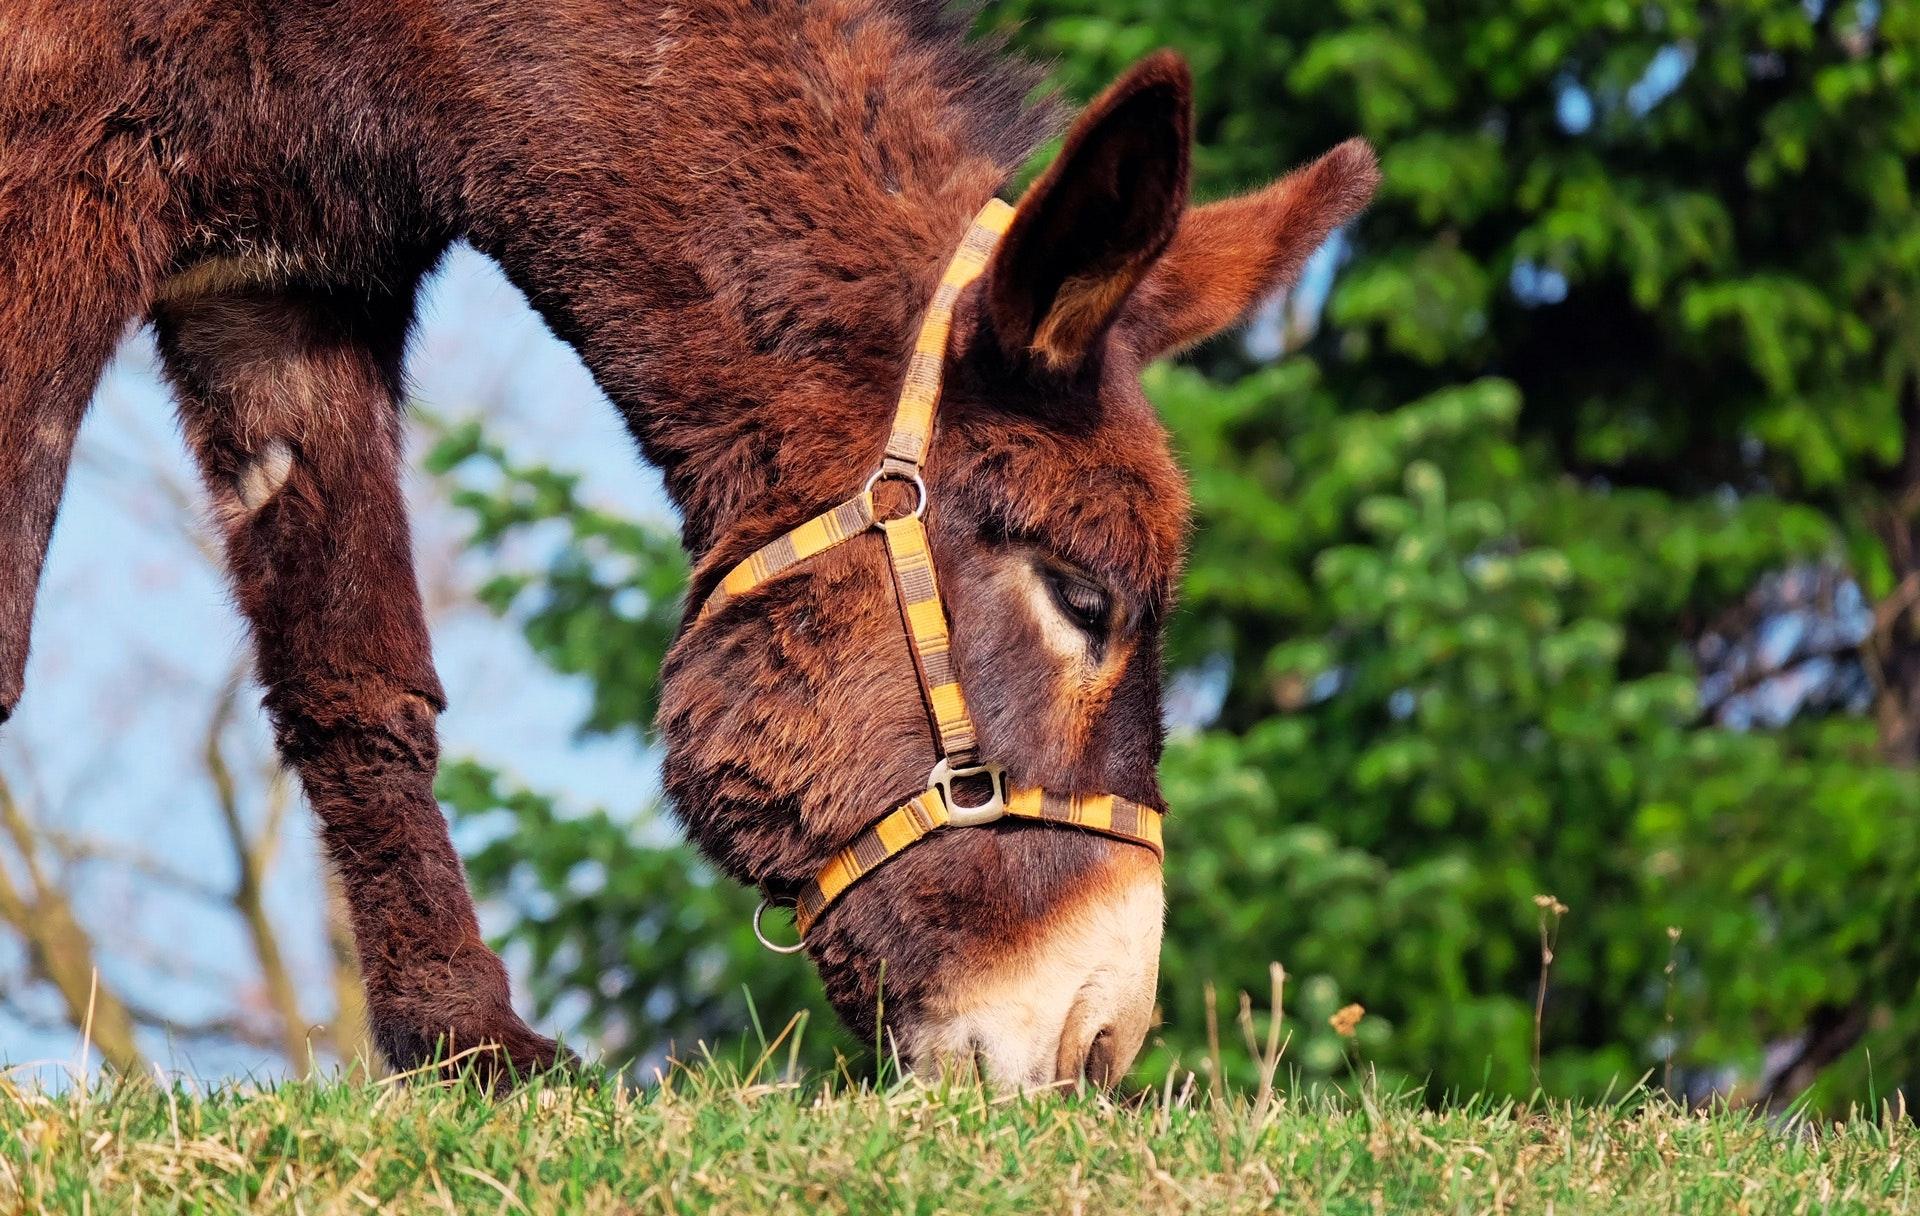 animal-cute-donkey-255343